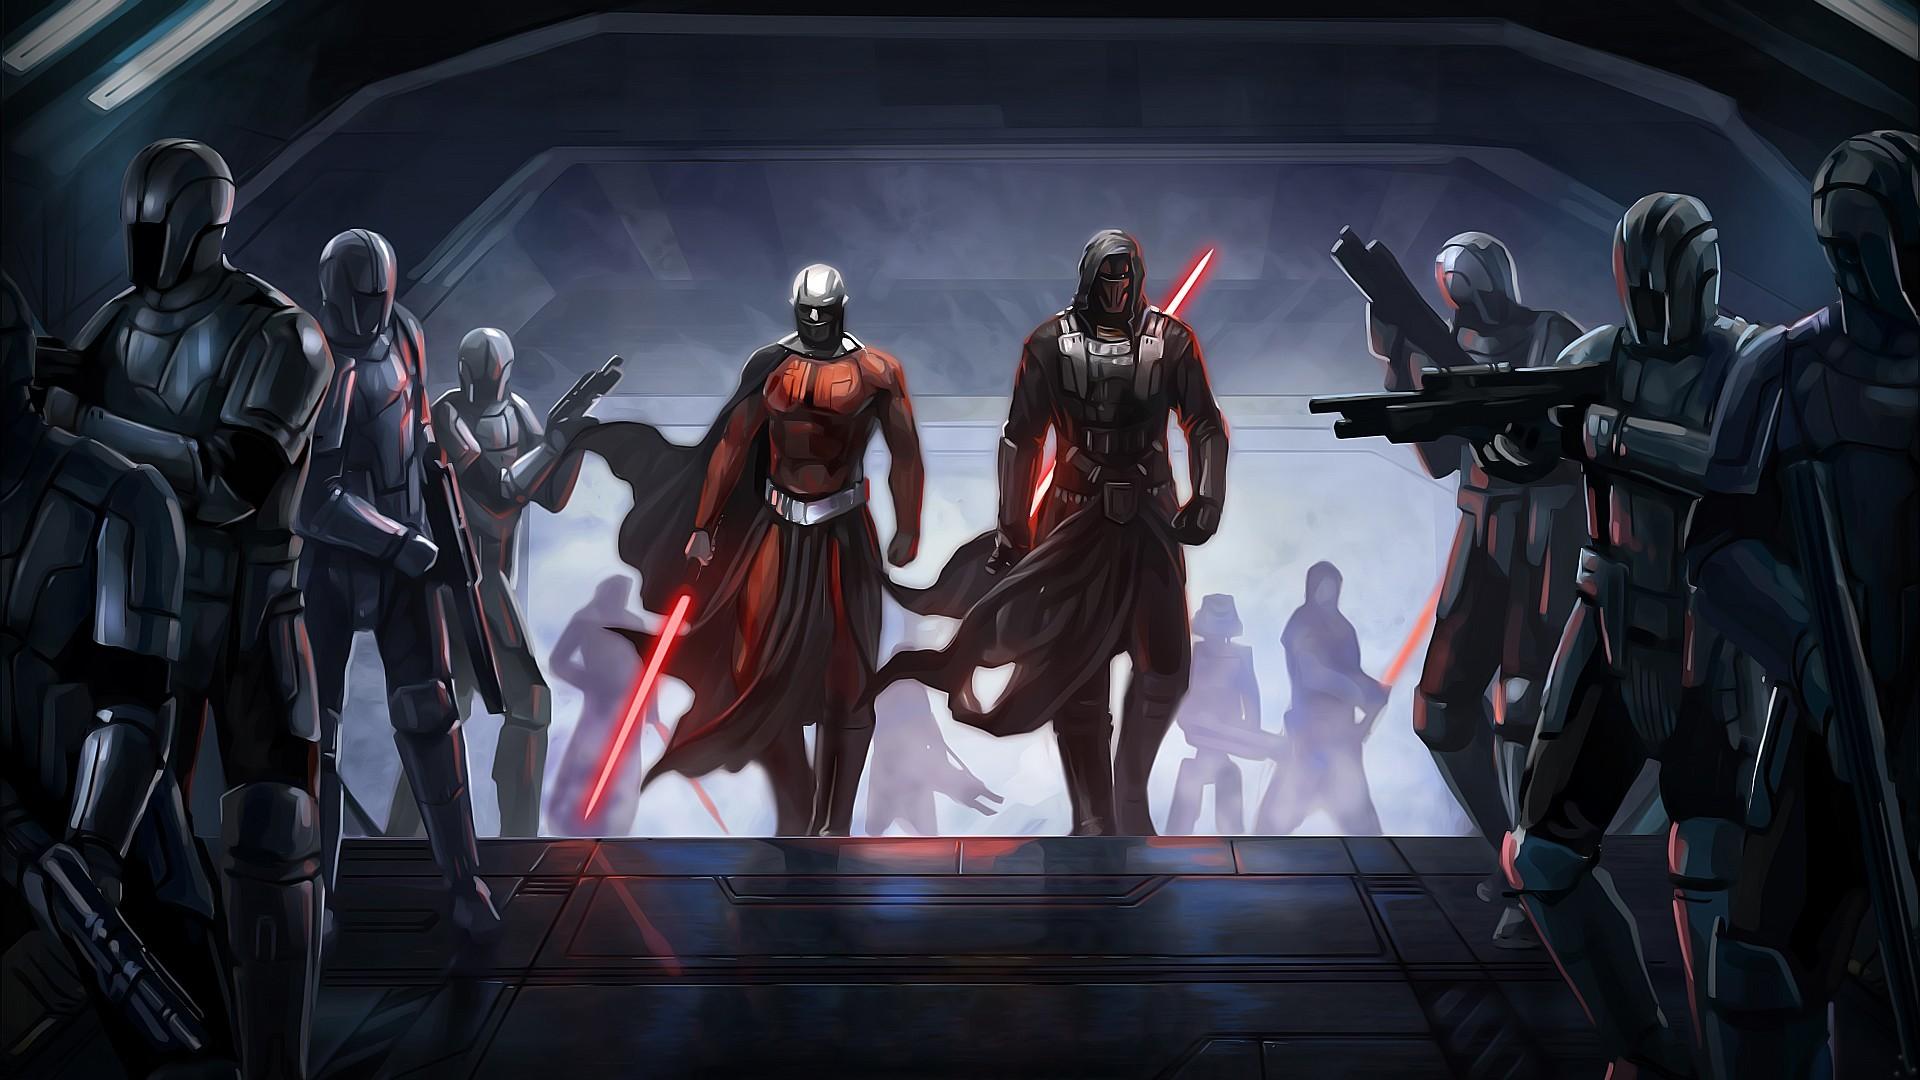 Video Game – Star Wars: The Old Republic Darth Malak Darth Revan Mandalorian  War Star